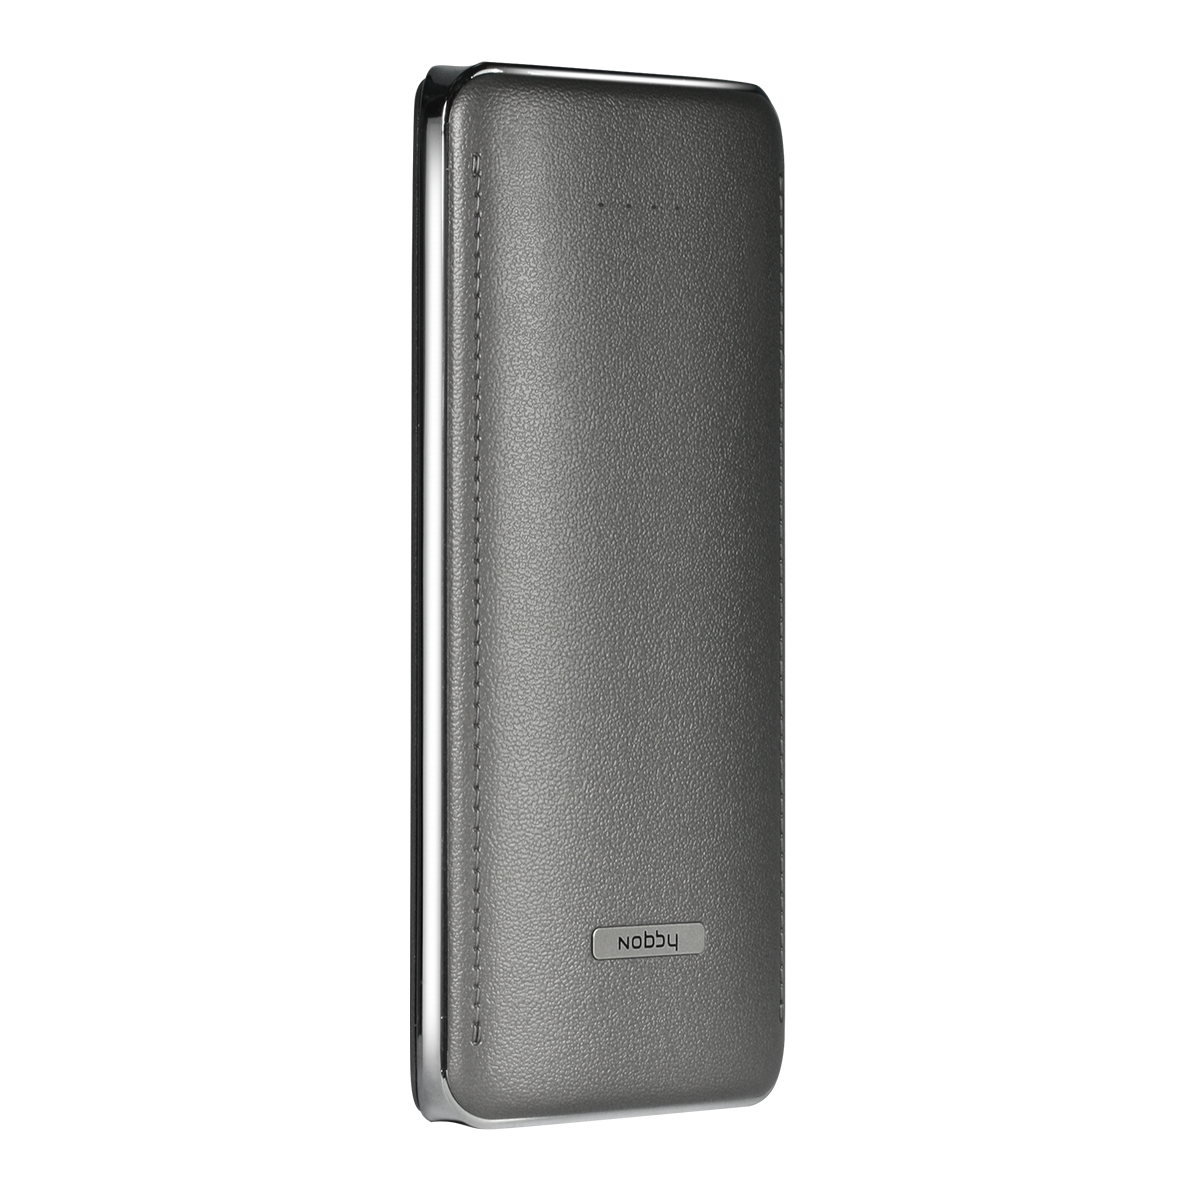 Nobby Comfort 017-002, Grey внешний аккумулятор (10 800 mAh) аккумулятор nobby slim 025 001 4000 mah usb 1 2а black 09282